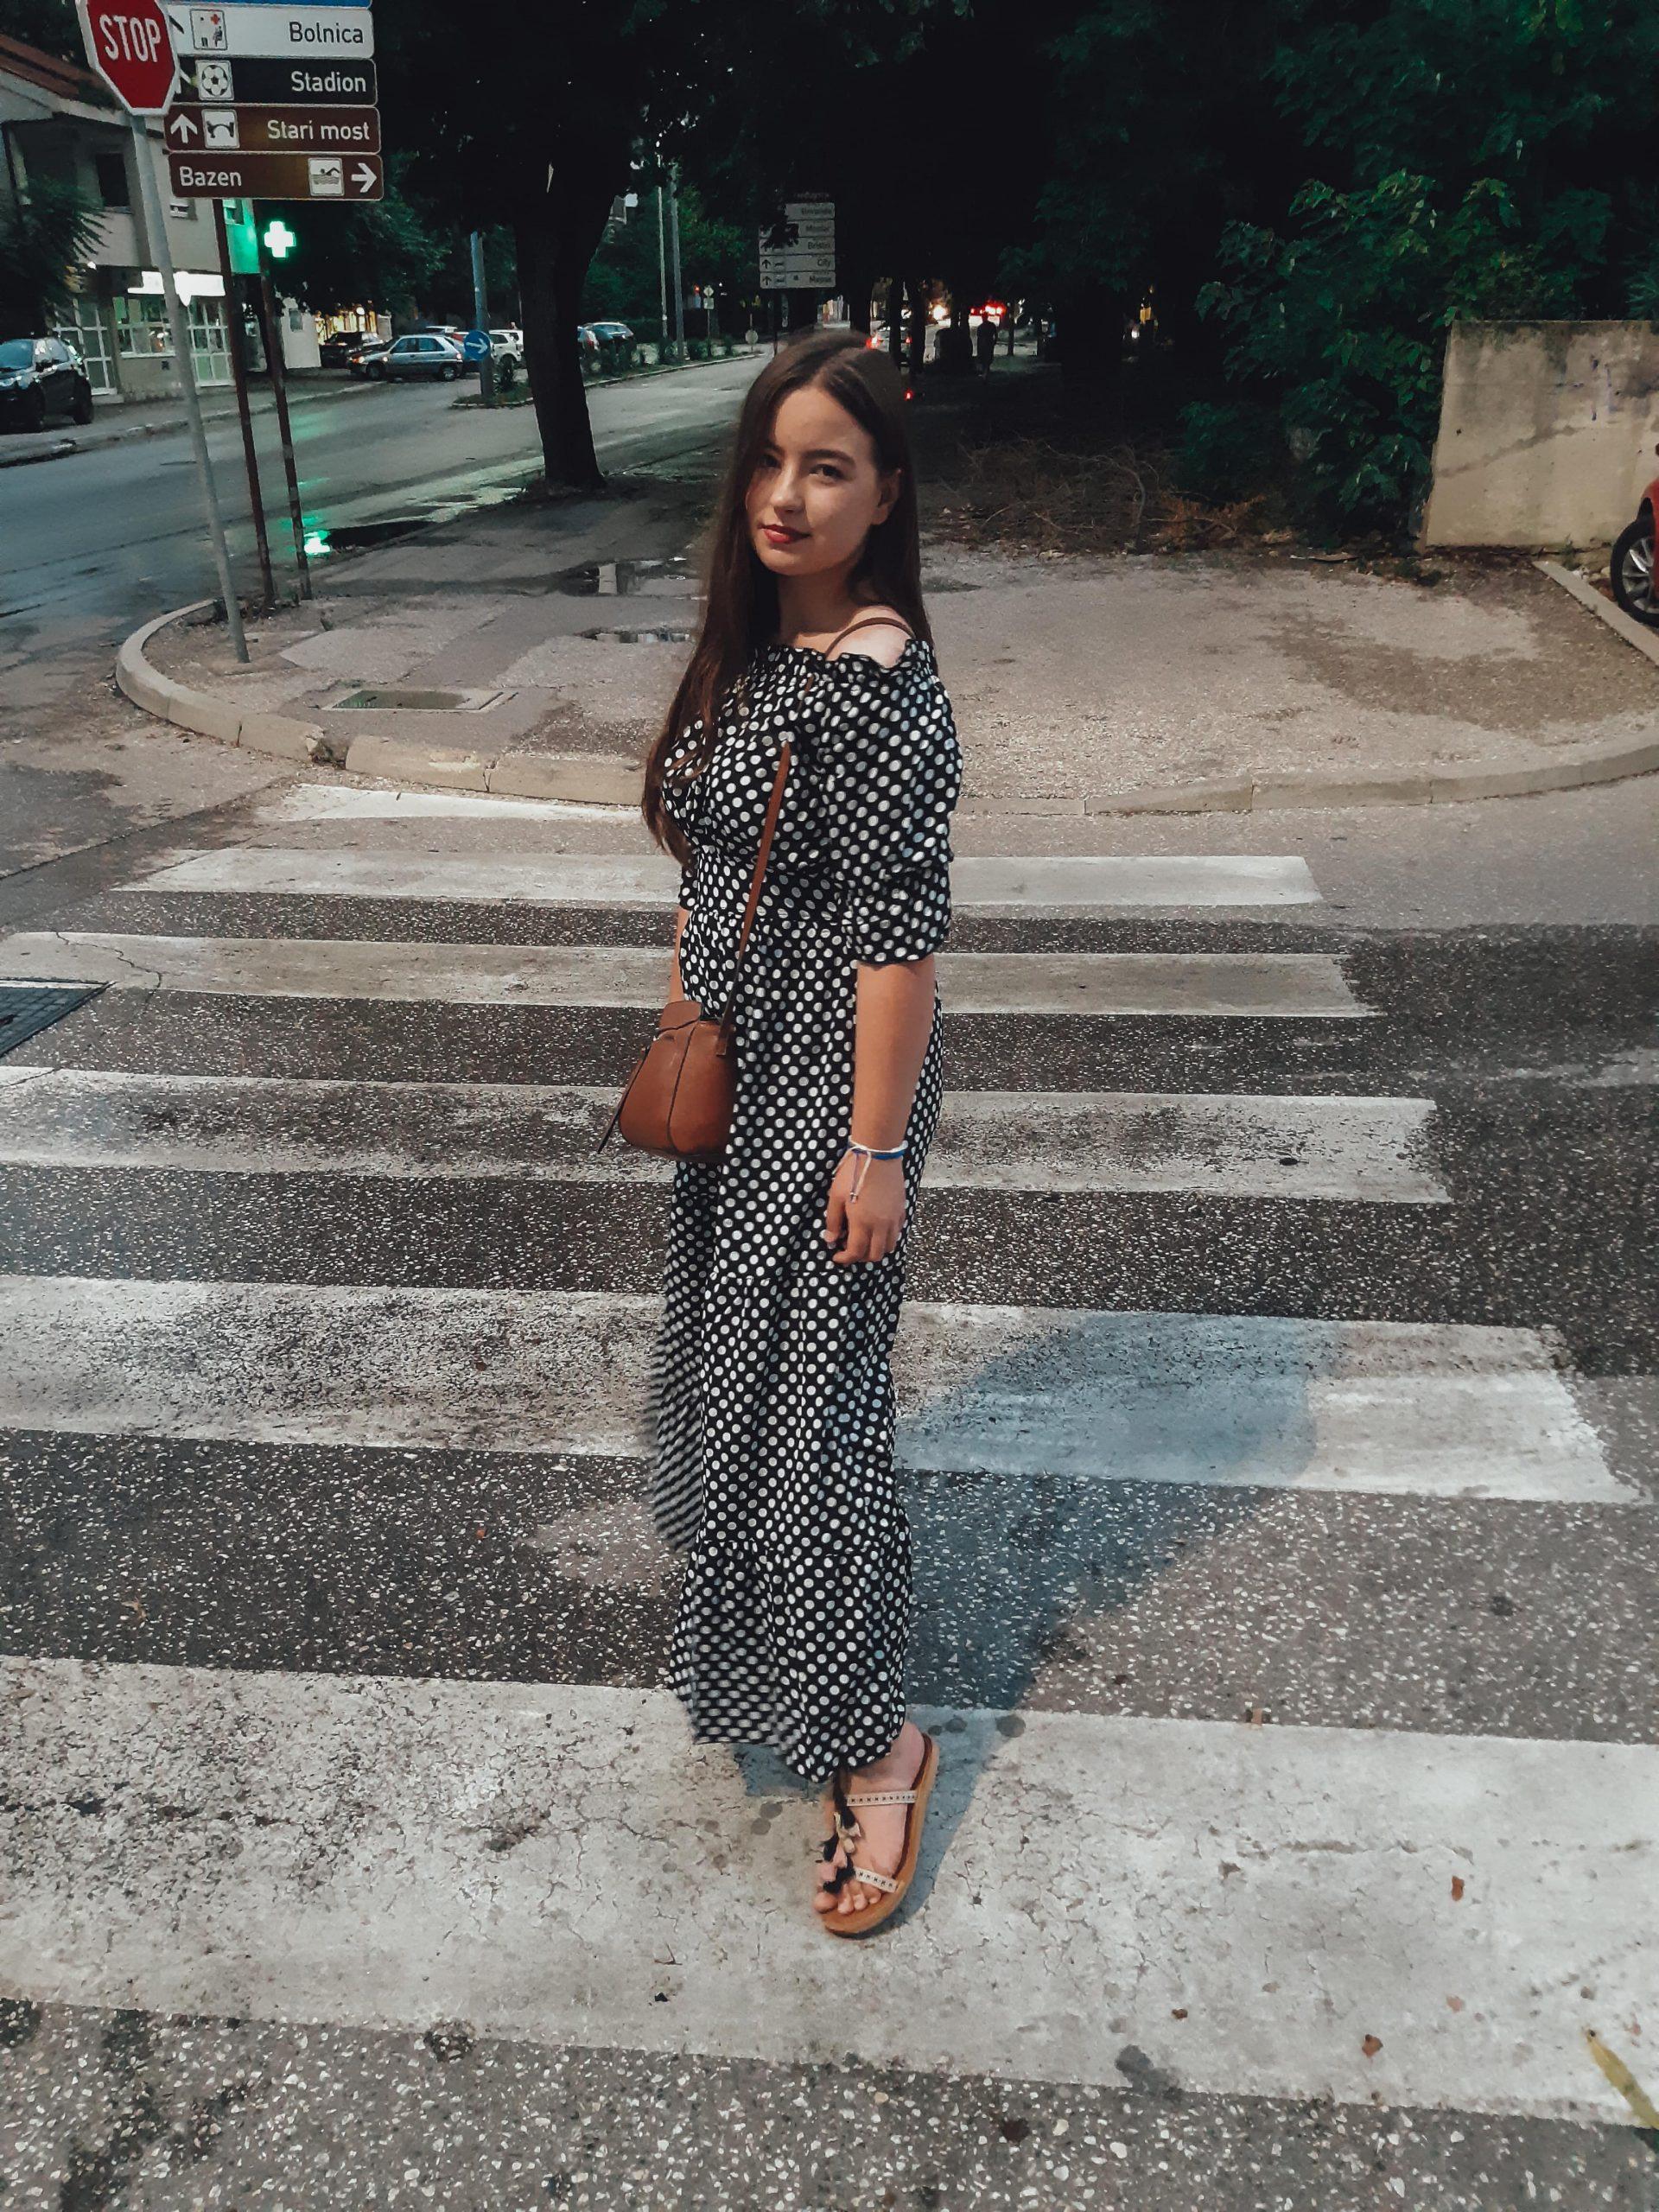 polka dot dress outfit livinglikev fashion blogger style blogger living like v vildana šuta vildana livinglikev polka dot pattern